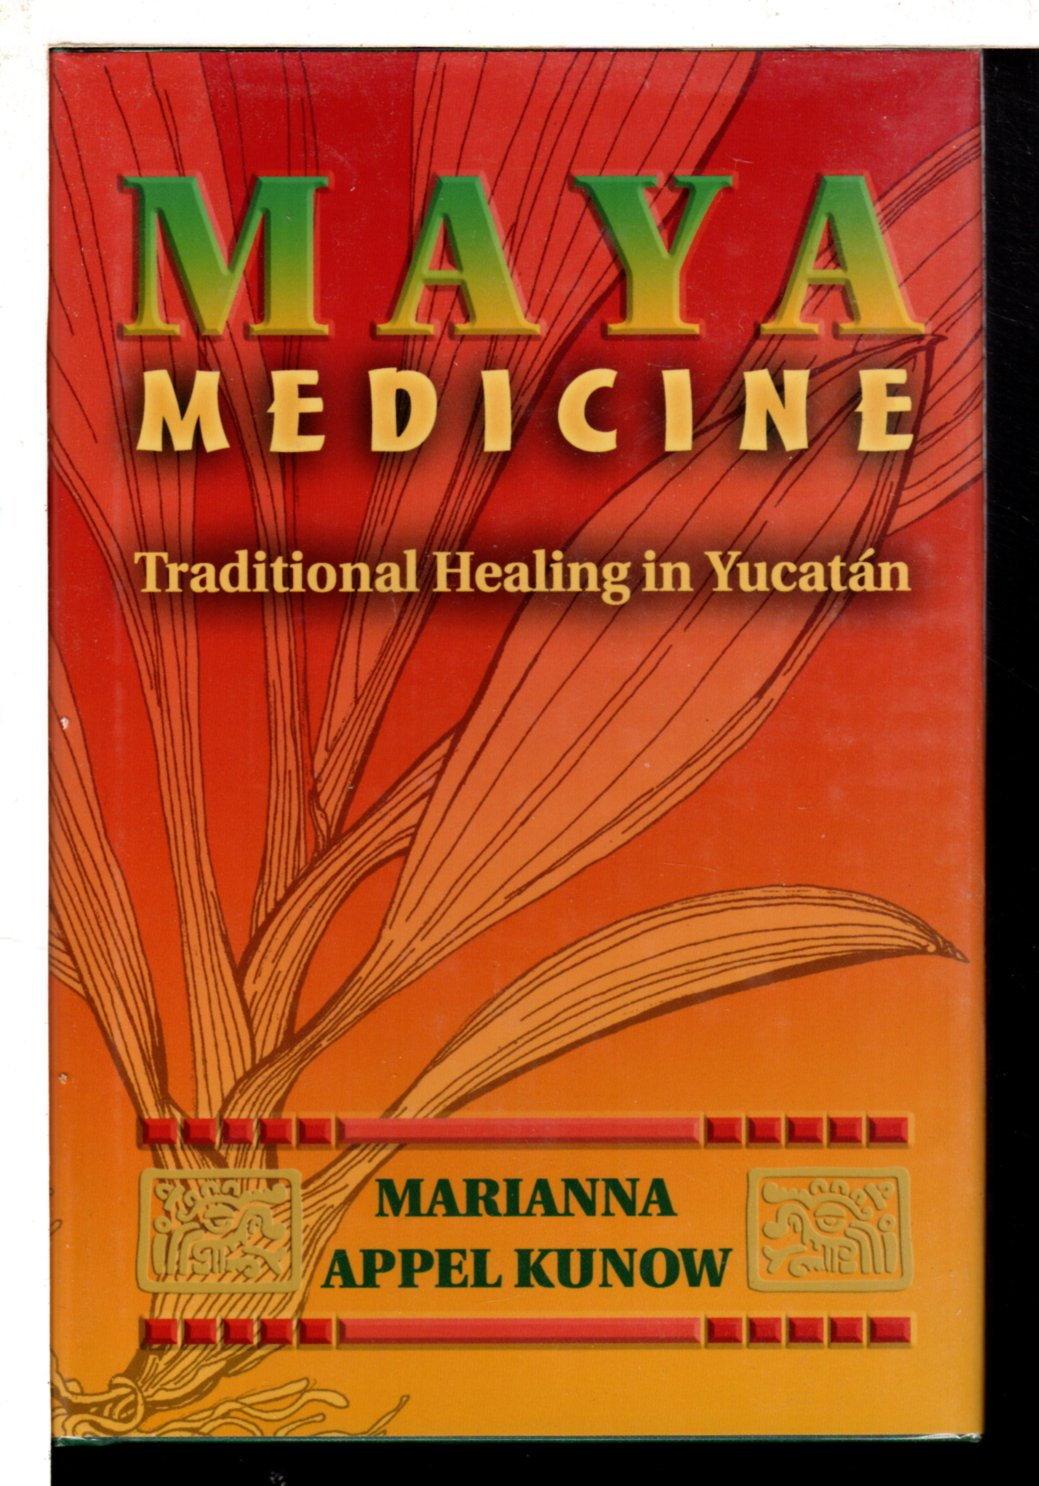 KUNOW, MARIANNA APPEL. - MAYA MEDICINE: Traditional Healing in Yucatan